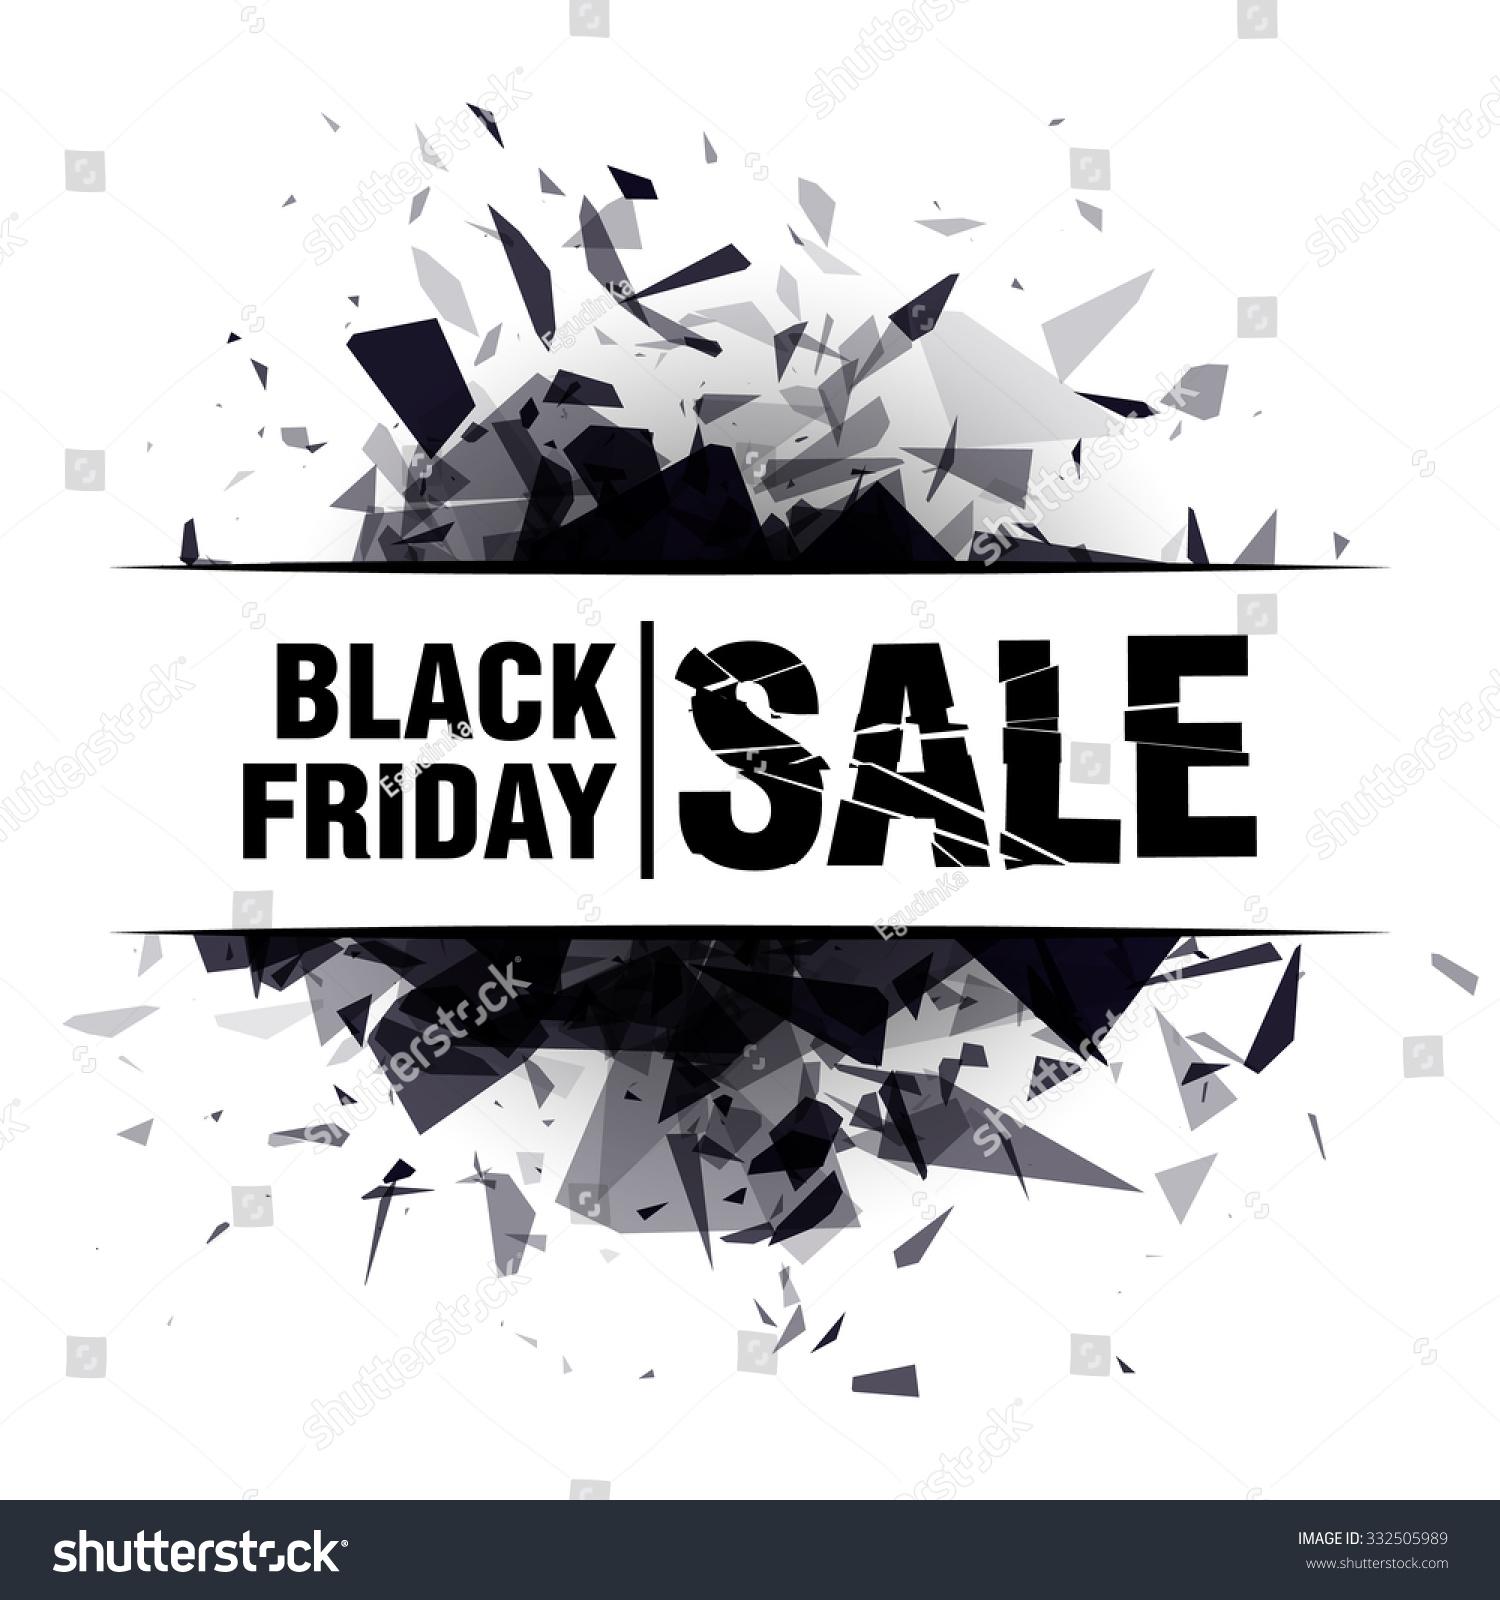 black friday sale abstract explosion black glass vector illustration 332505989 shutterstock. Black Bedroom Furniture Sets. Home Design Ideas